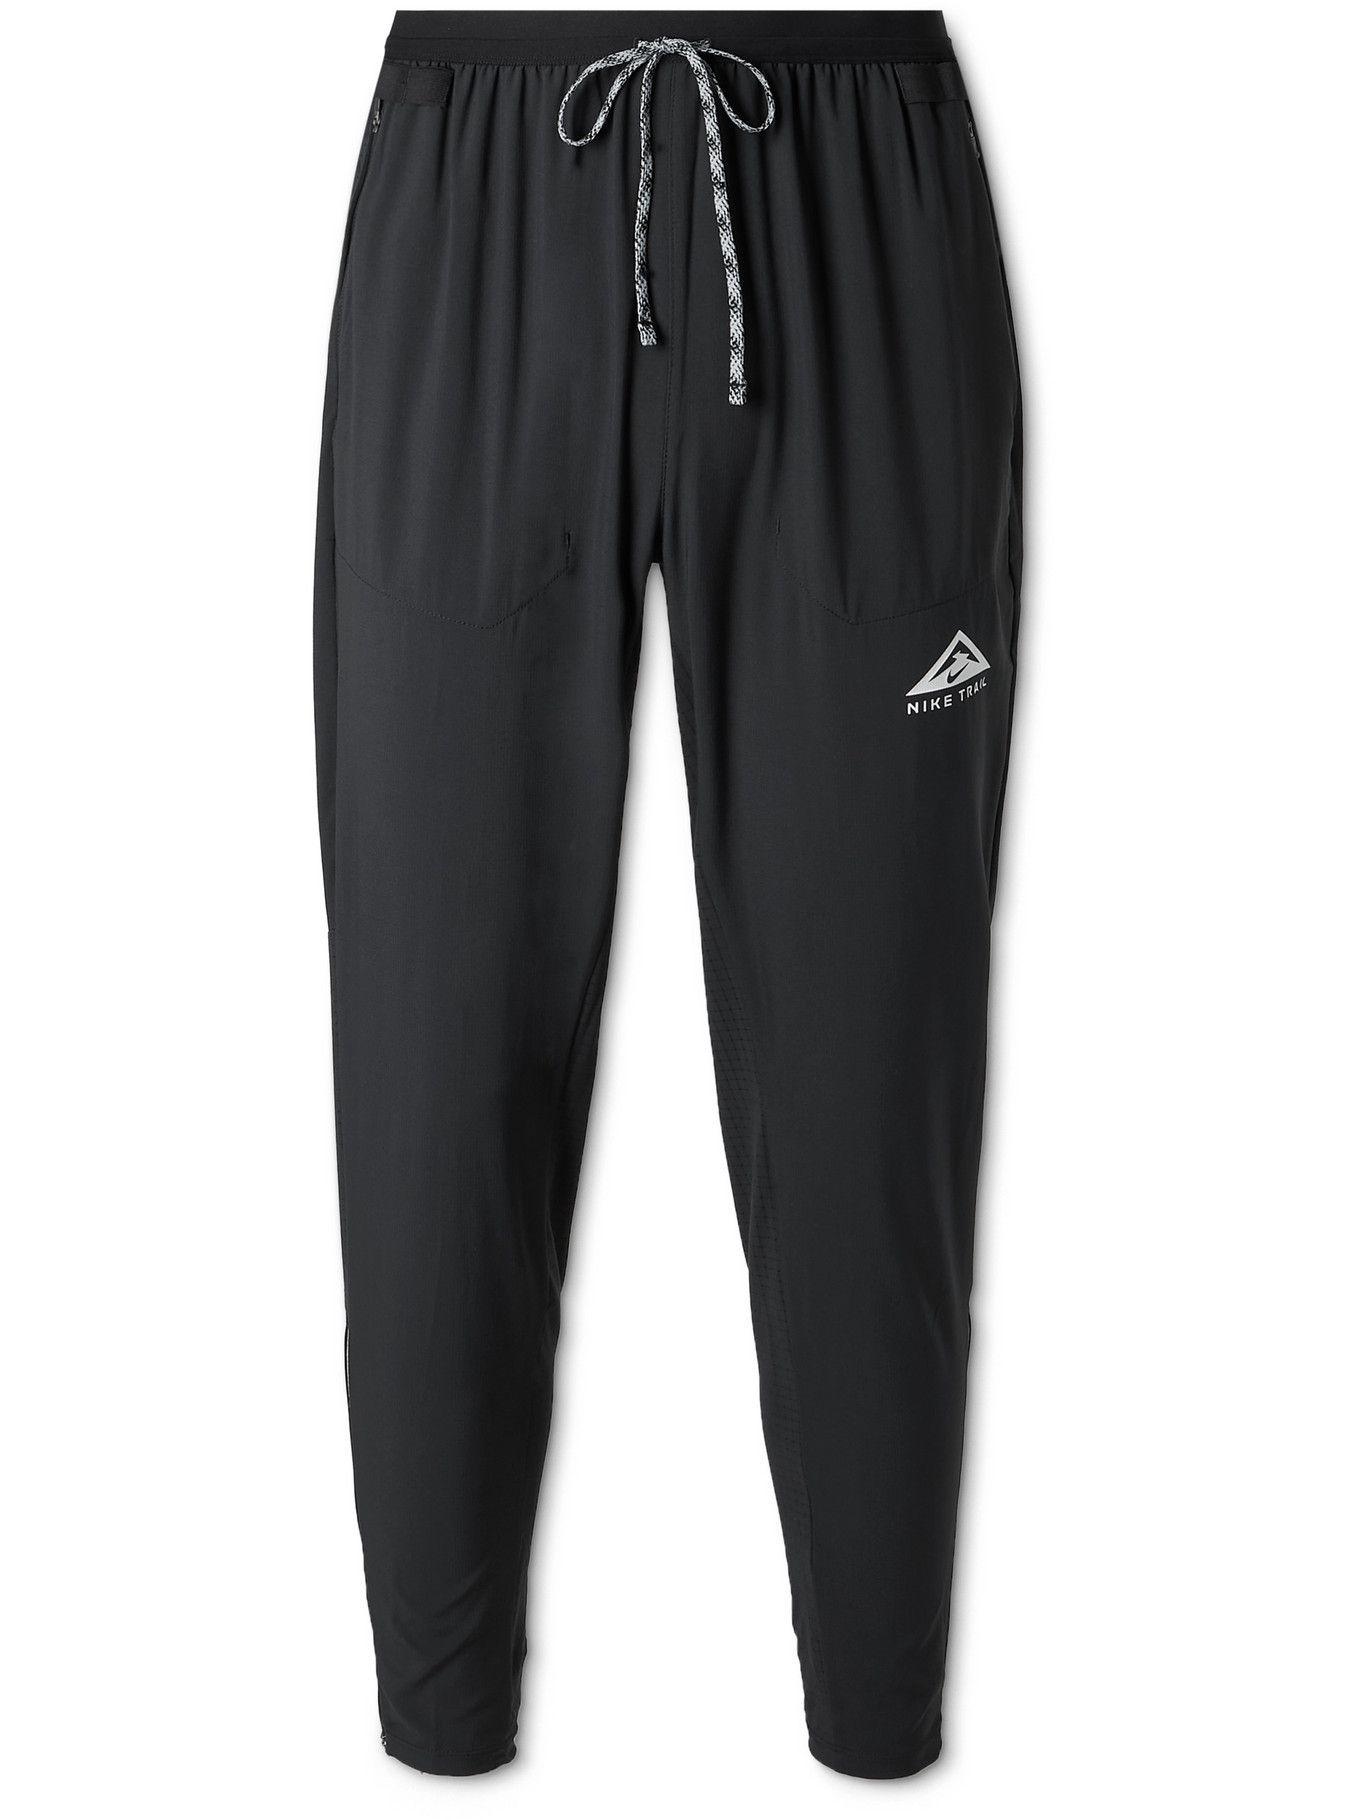 NIKE RUNNING - Phenom Elite Tapered Logo-Print Dri-FIT Flex Track Pants - Black